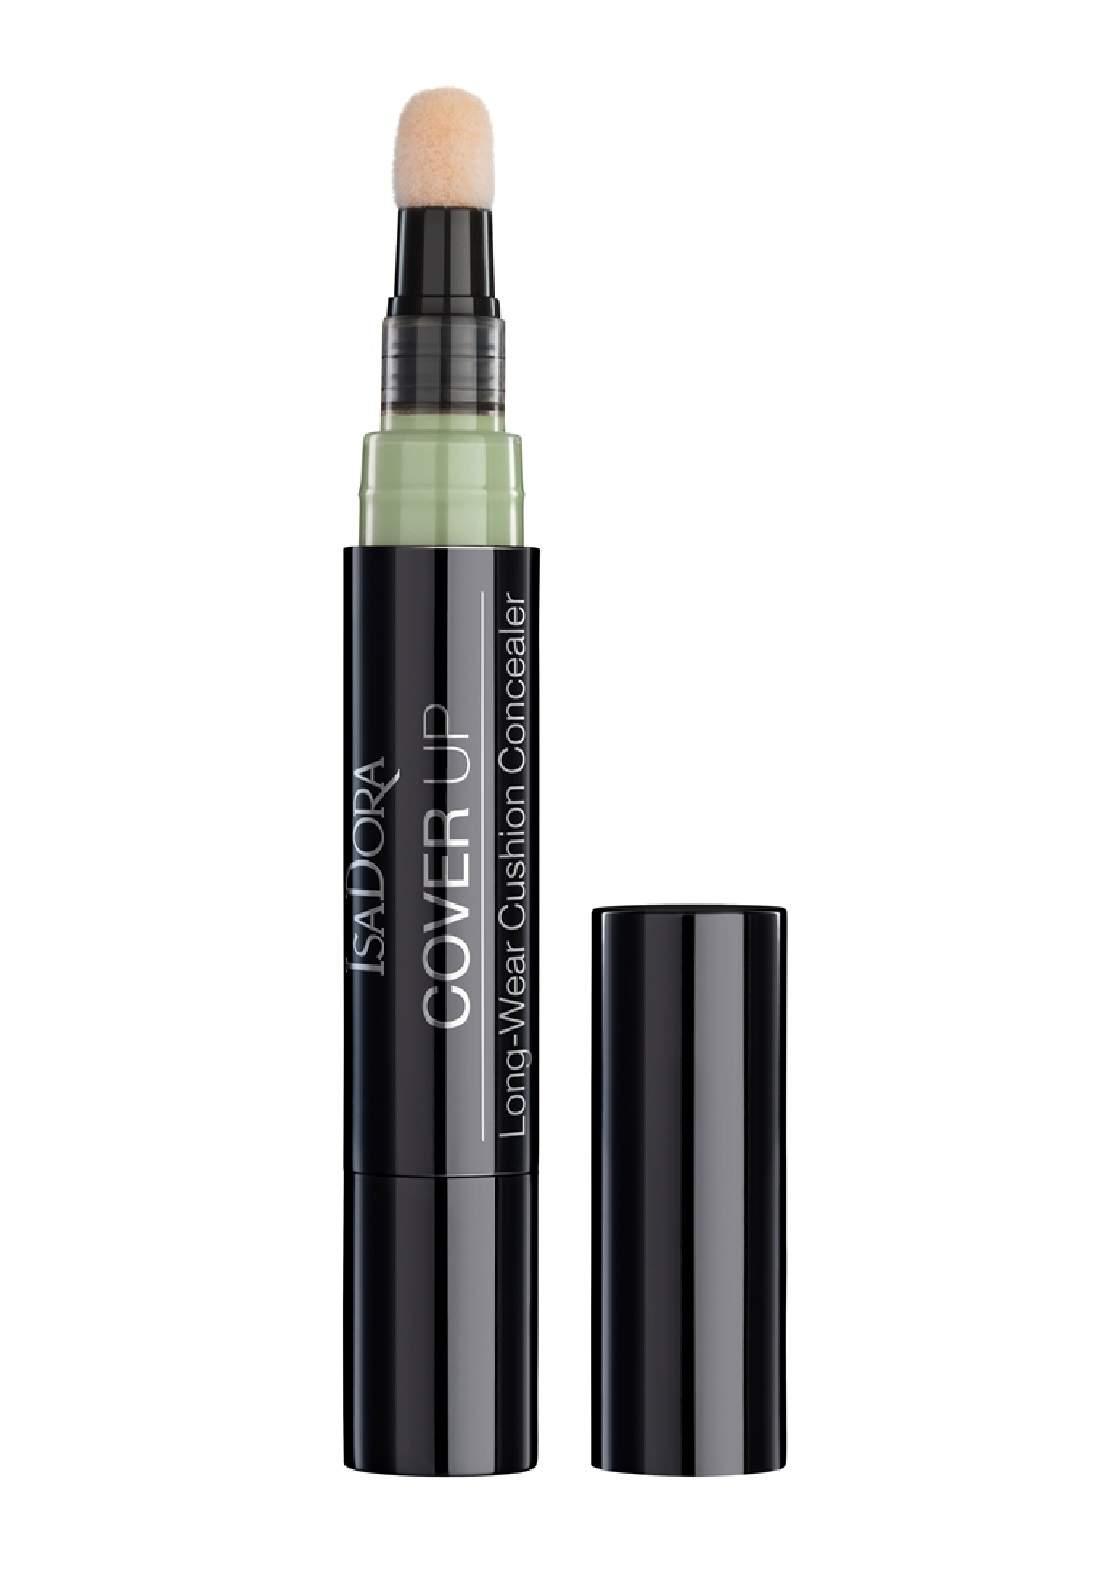 IsaDora 314284 Cover Up Long-Wear Cushion Concealer - Green   خافي عيوب